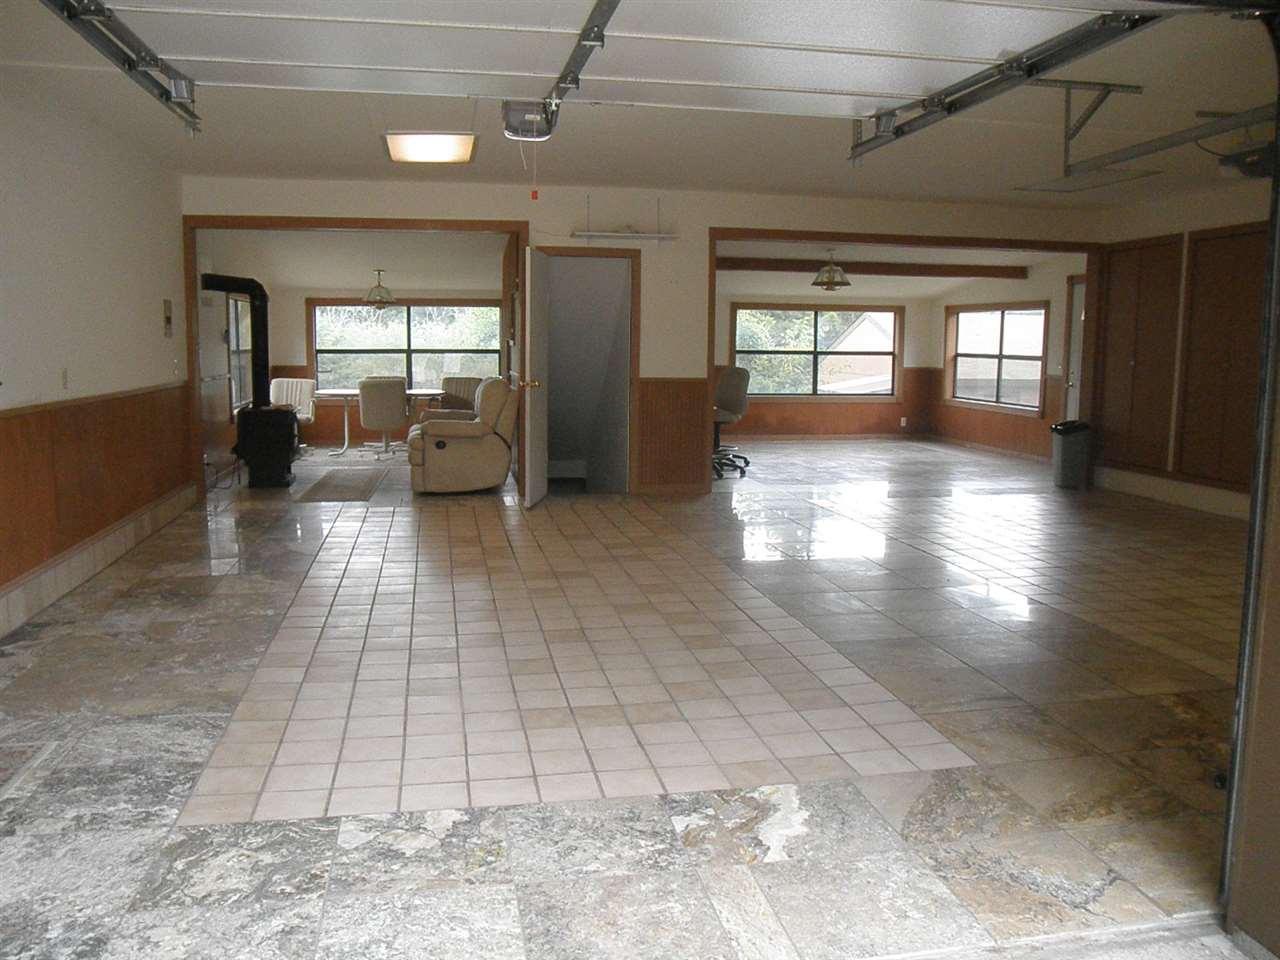 #century21groupone, #homesforsaleponcacity, #poncacityrealestate | 5317 Hunt Road Ponca City, OK 74604 30